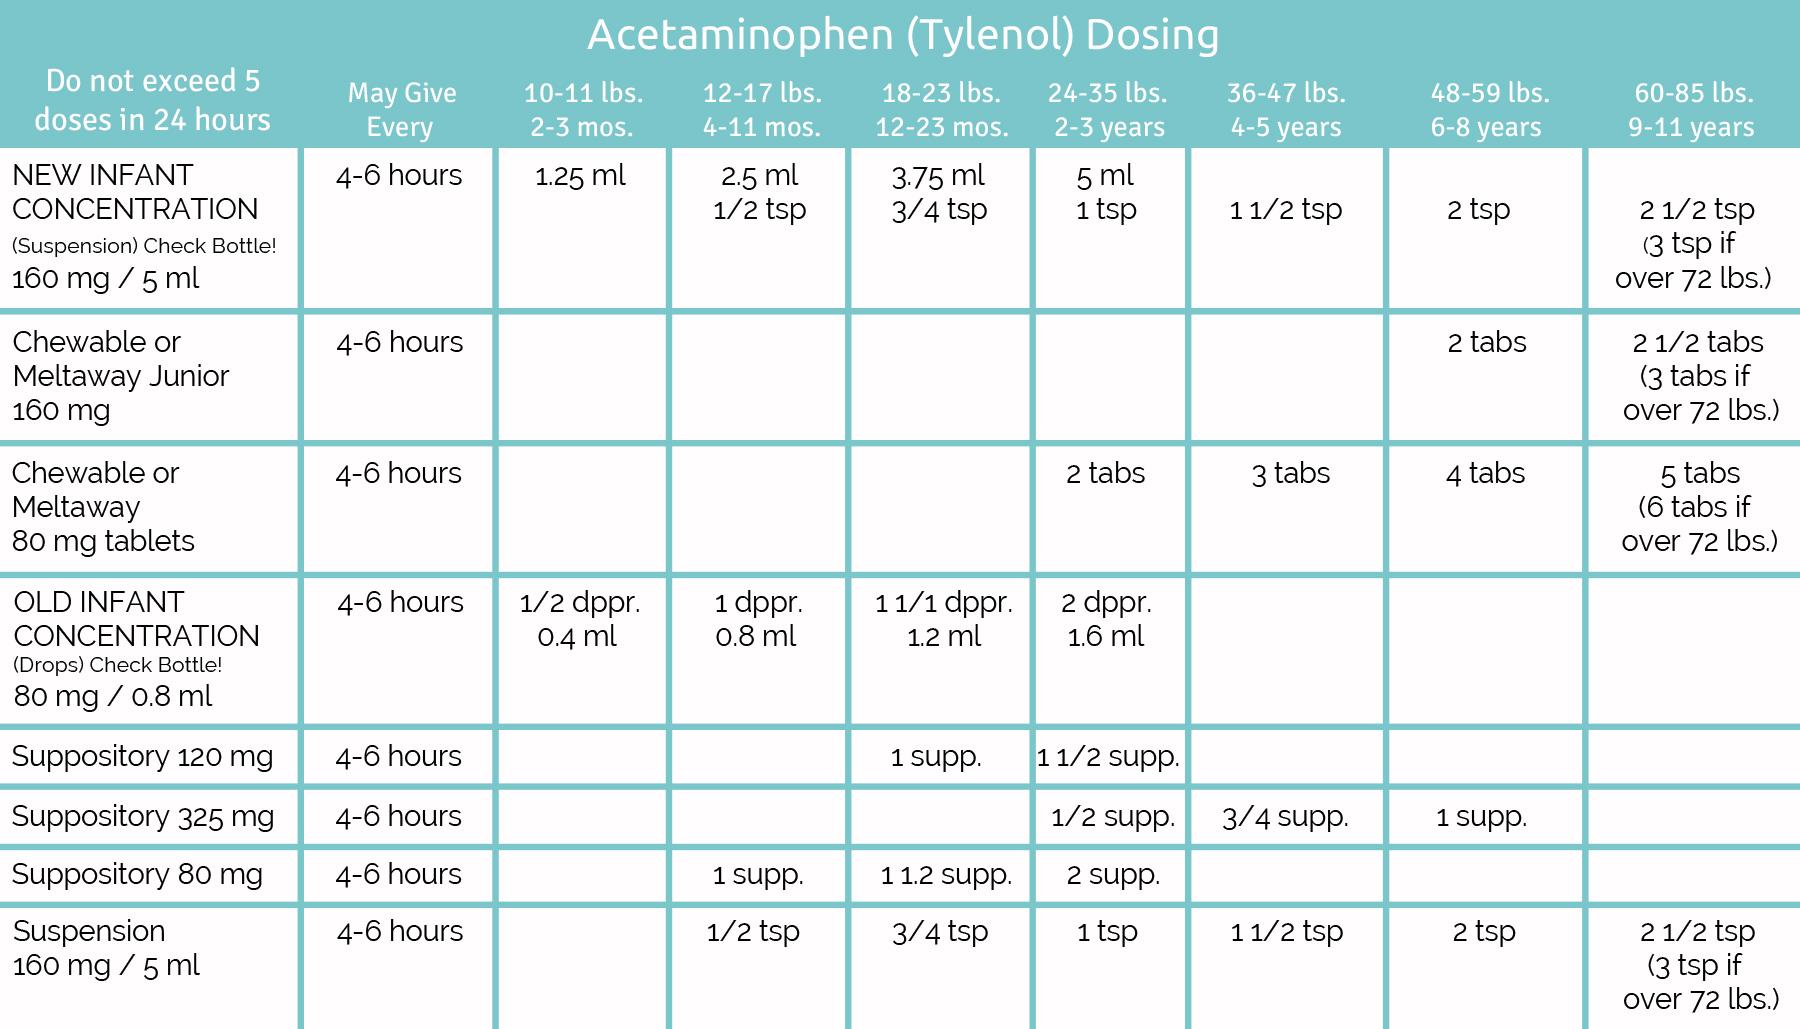 medicine dose for pediatric chart: Medication dosage tables latouche pediatrics llc